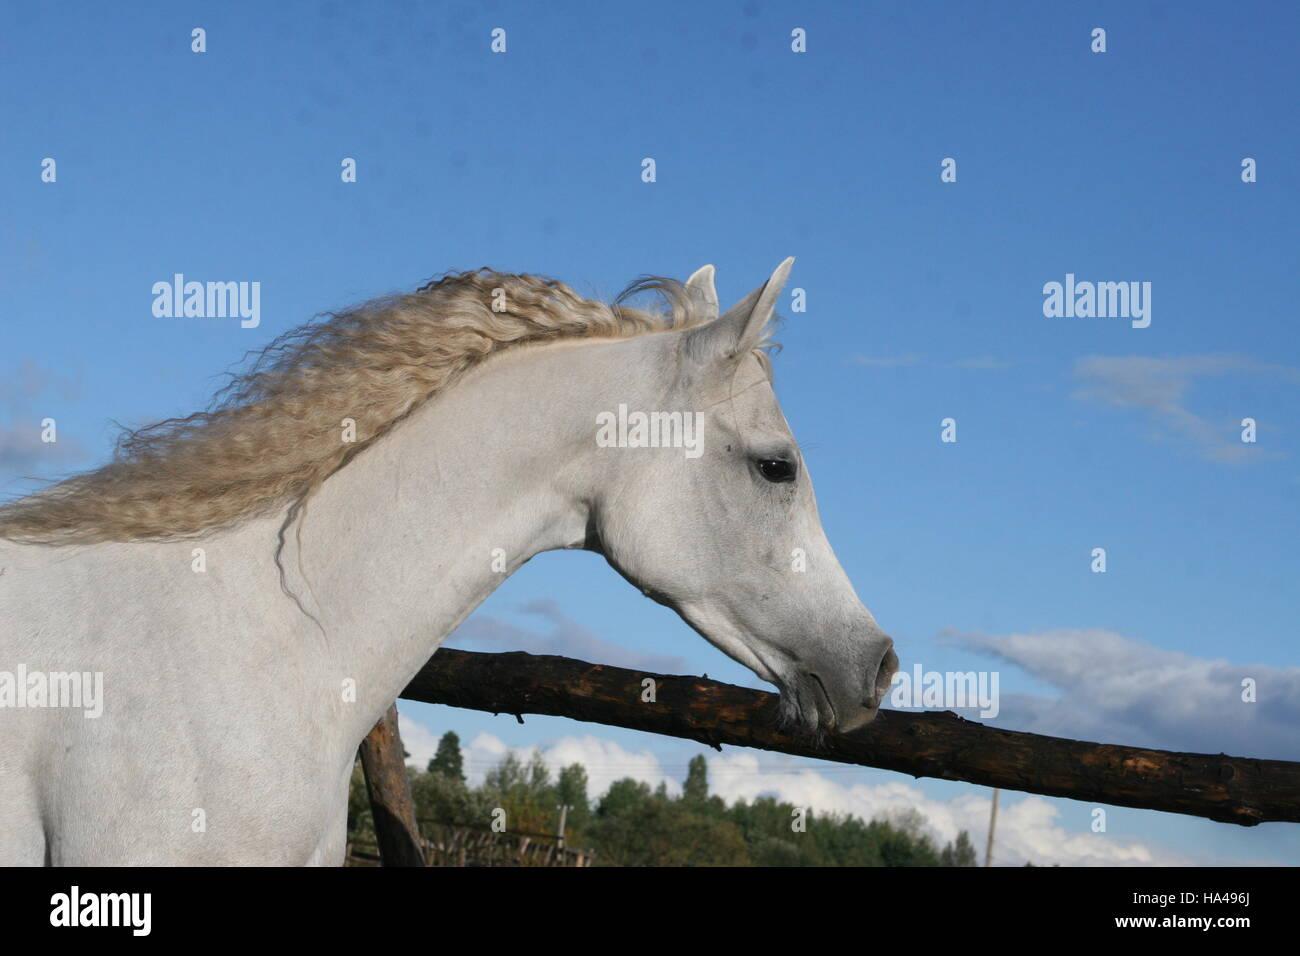 Arabian Horse Head Of White Arab Horse With A Flying Mane Stock Photo Alamy